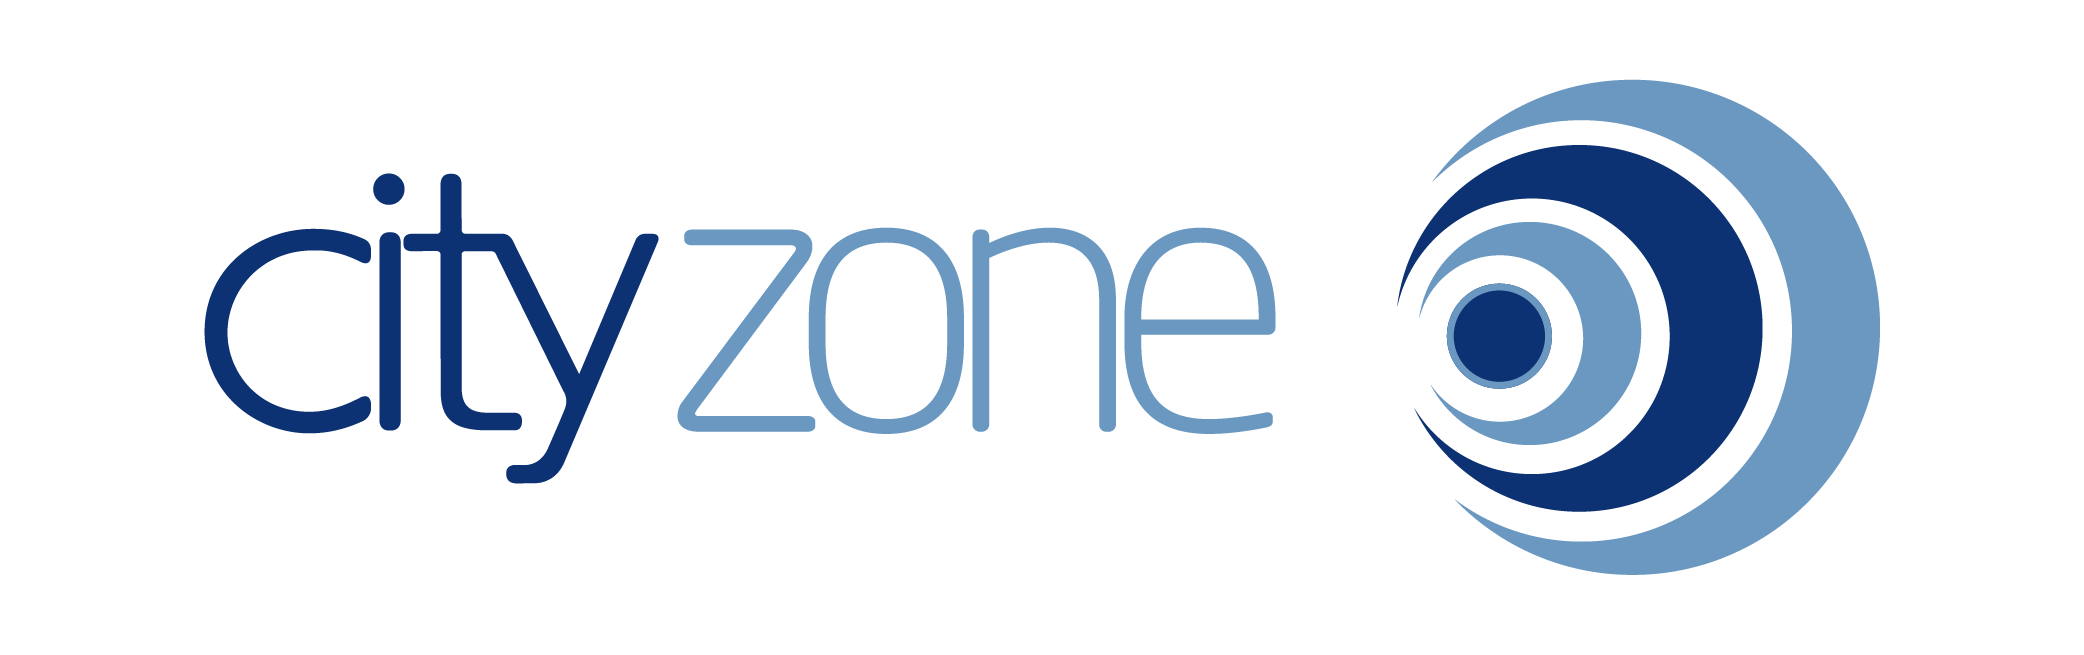 Image of the city zone logo